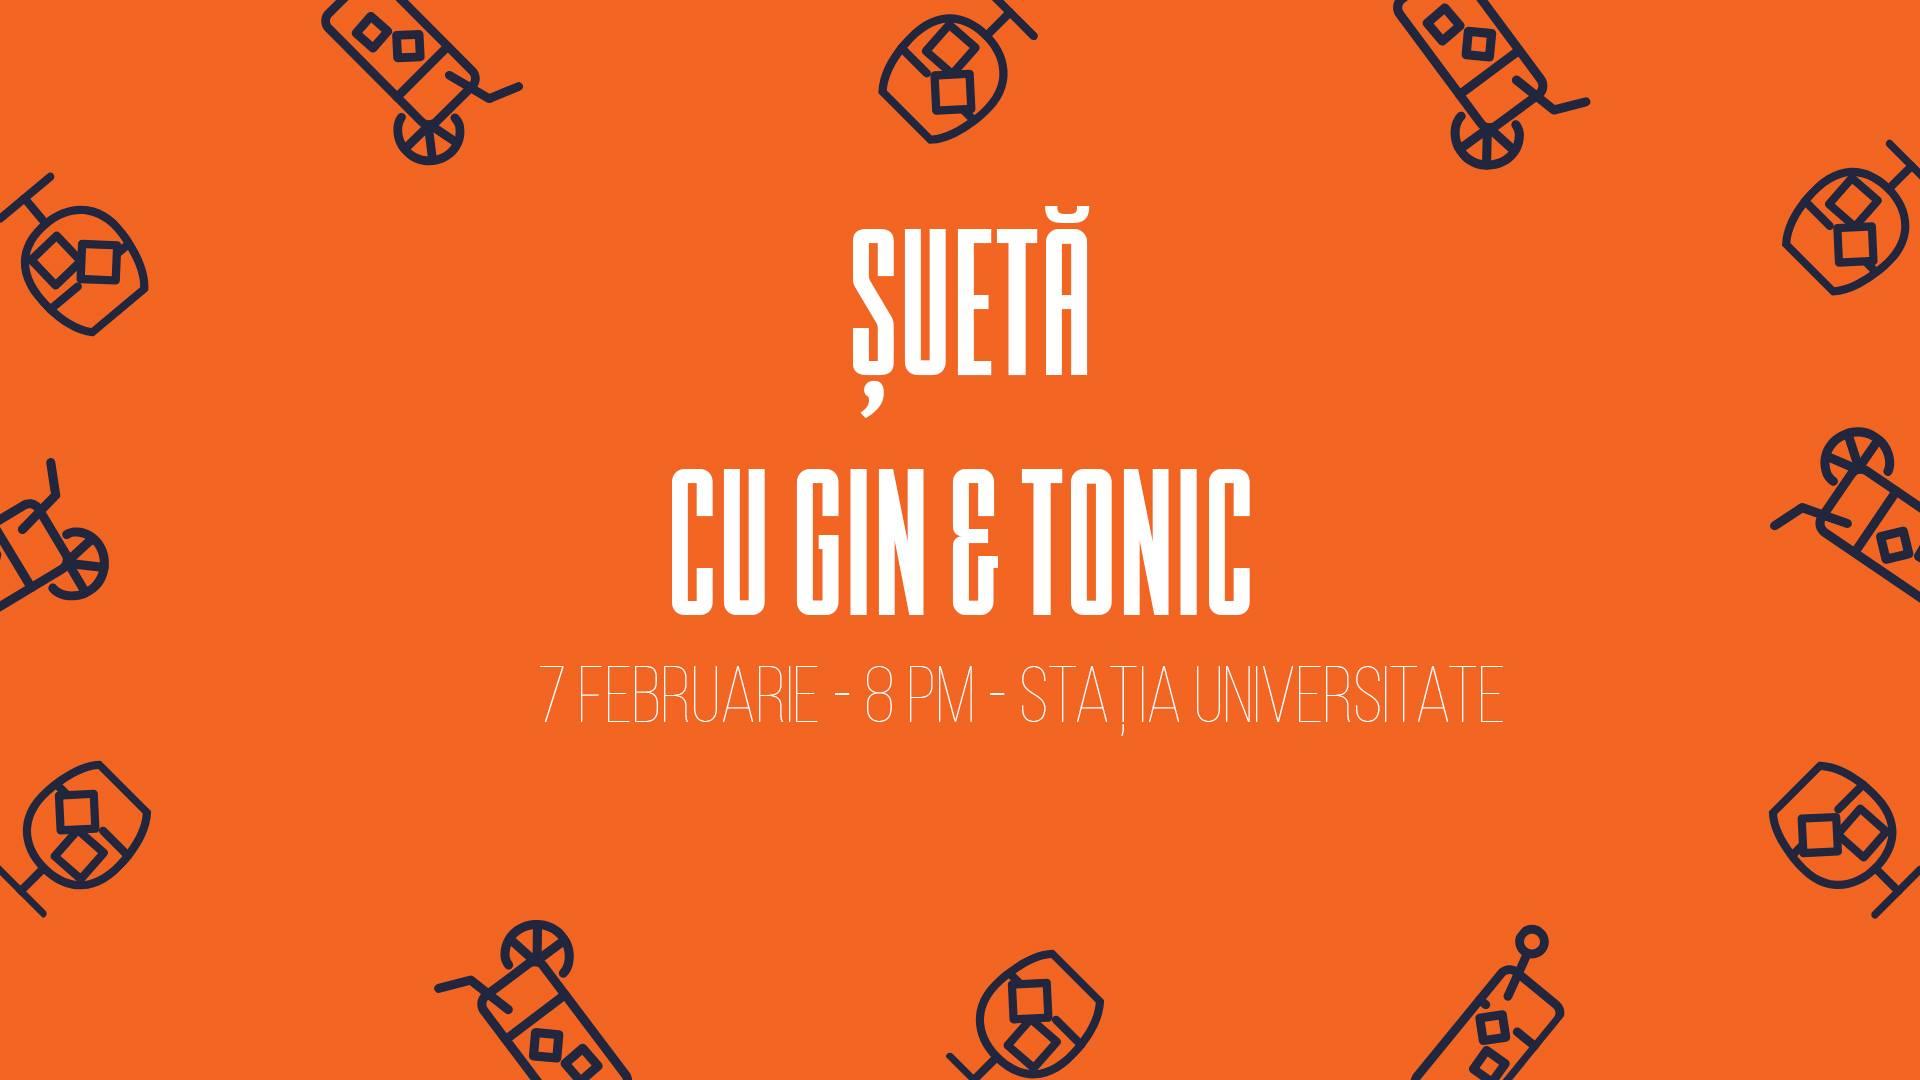 sueta cu gin tonic weekend 7-9 februarie